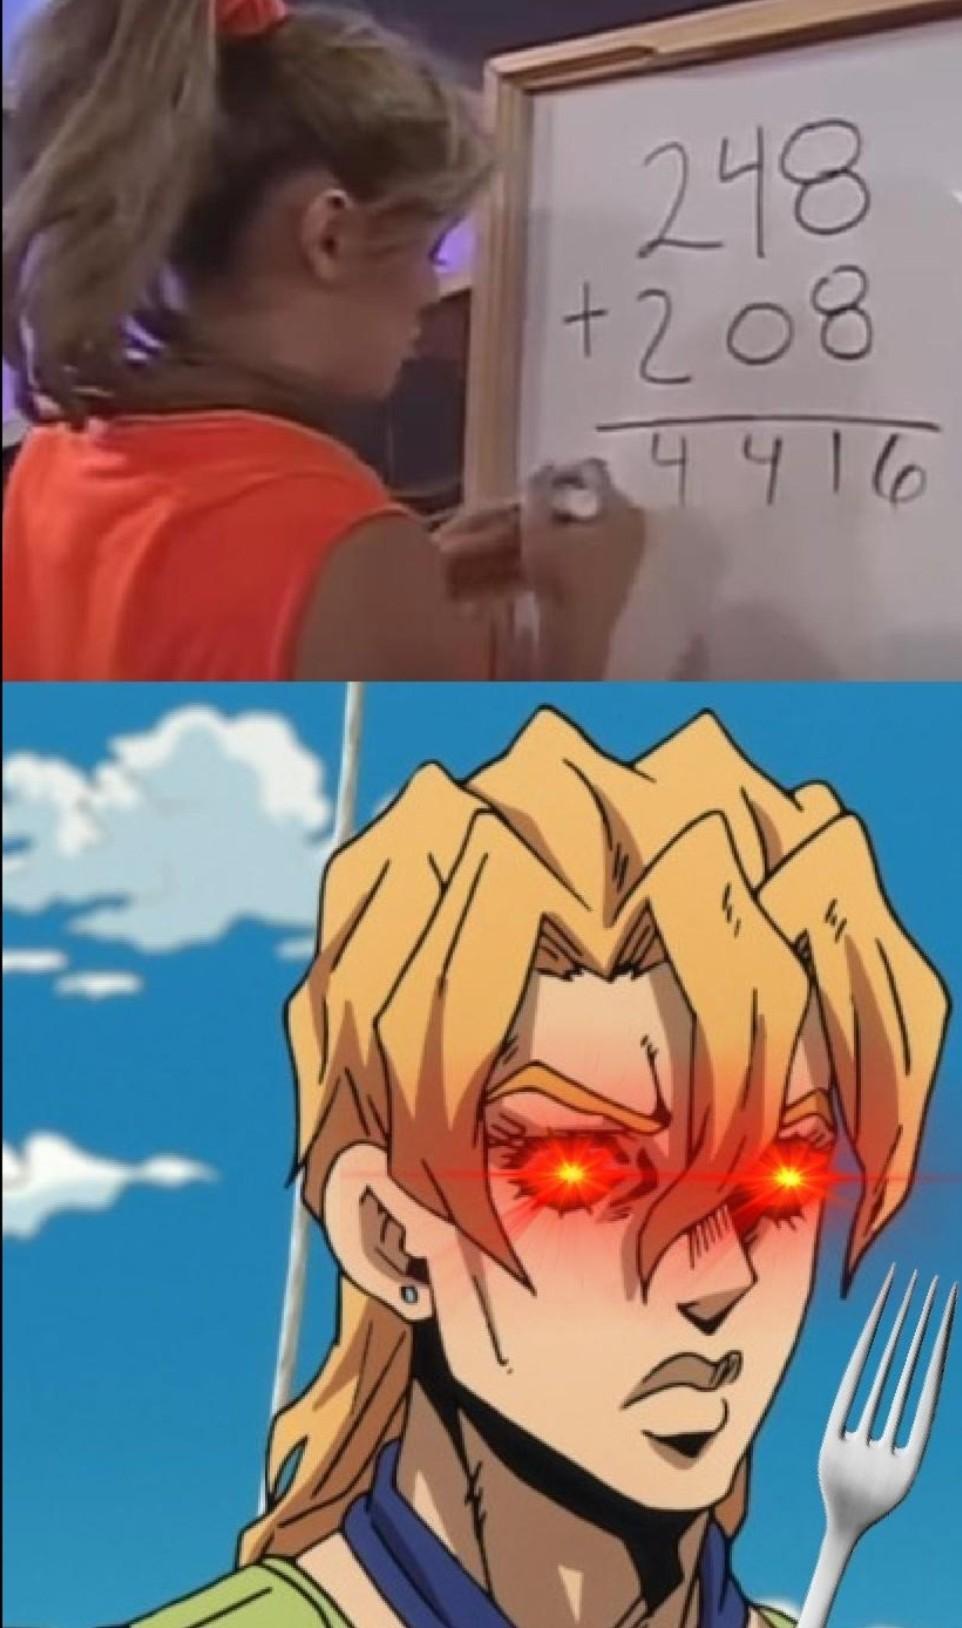 Cursed Fugo noises - meme